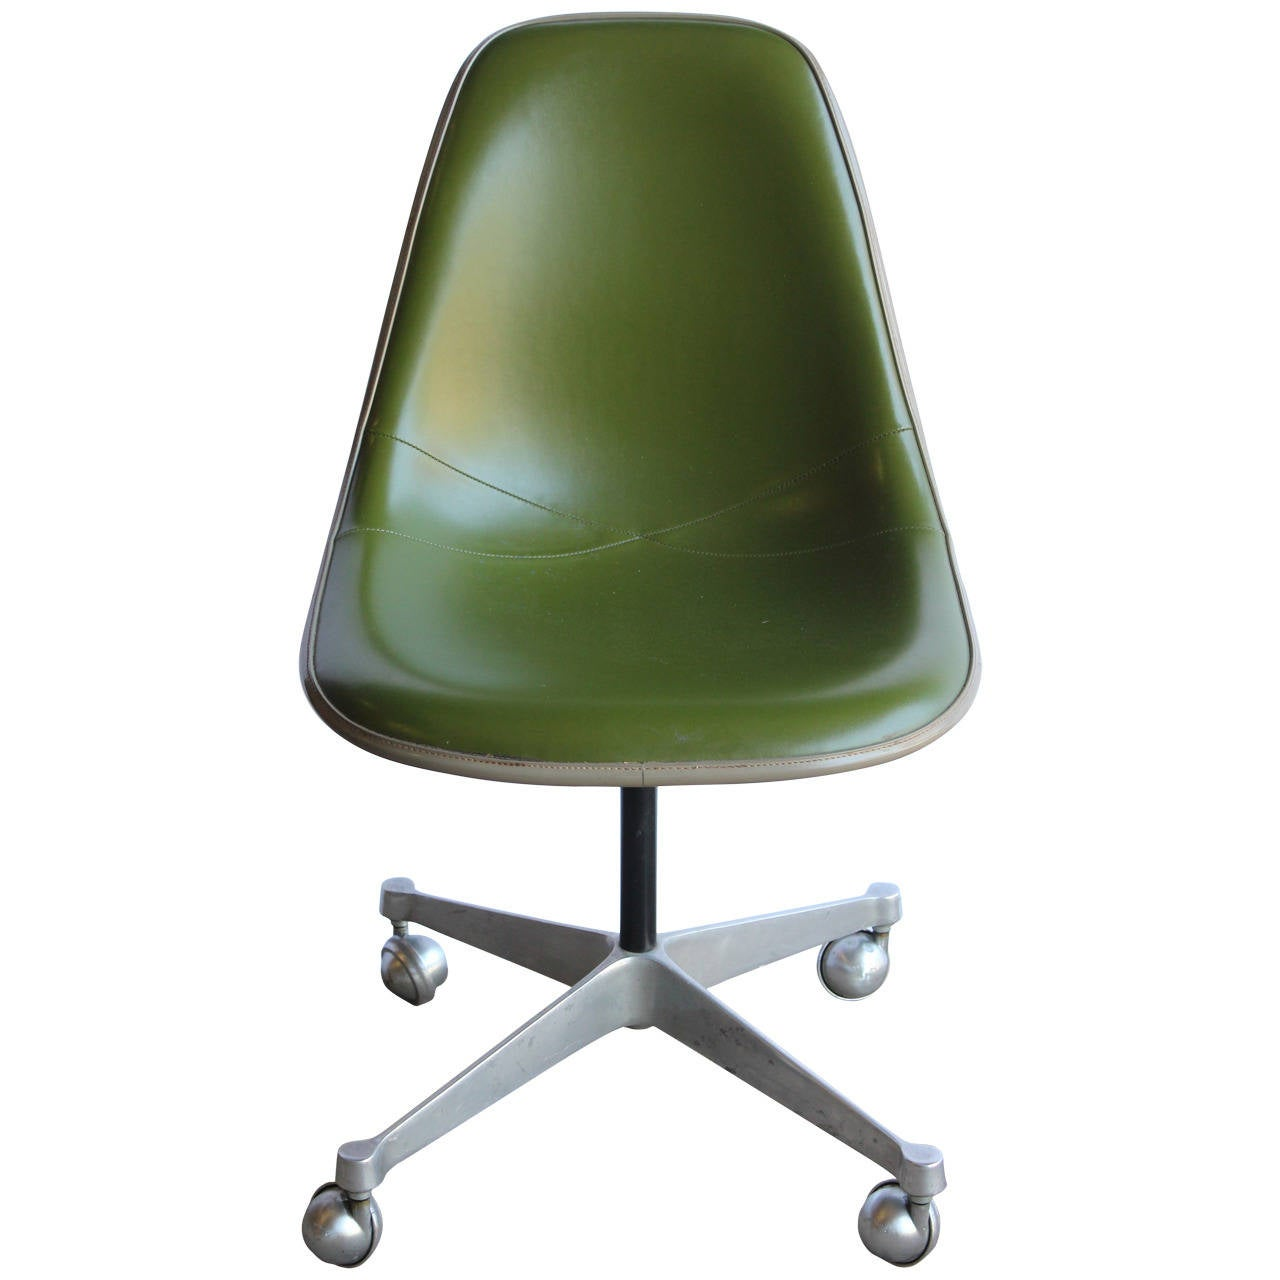 1960s Charles Eames Desk Chair for Herman Miller at 1stdibs